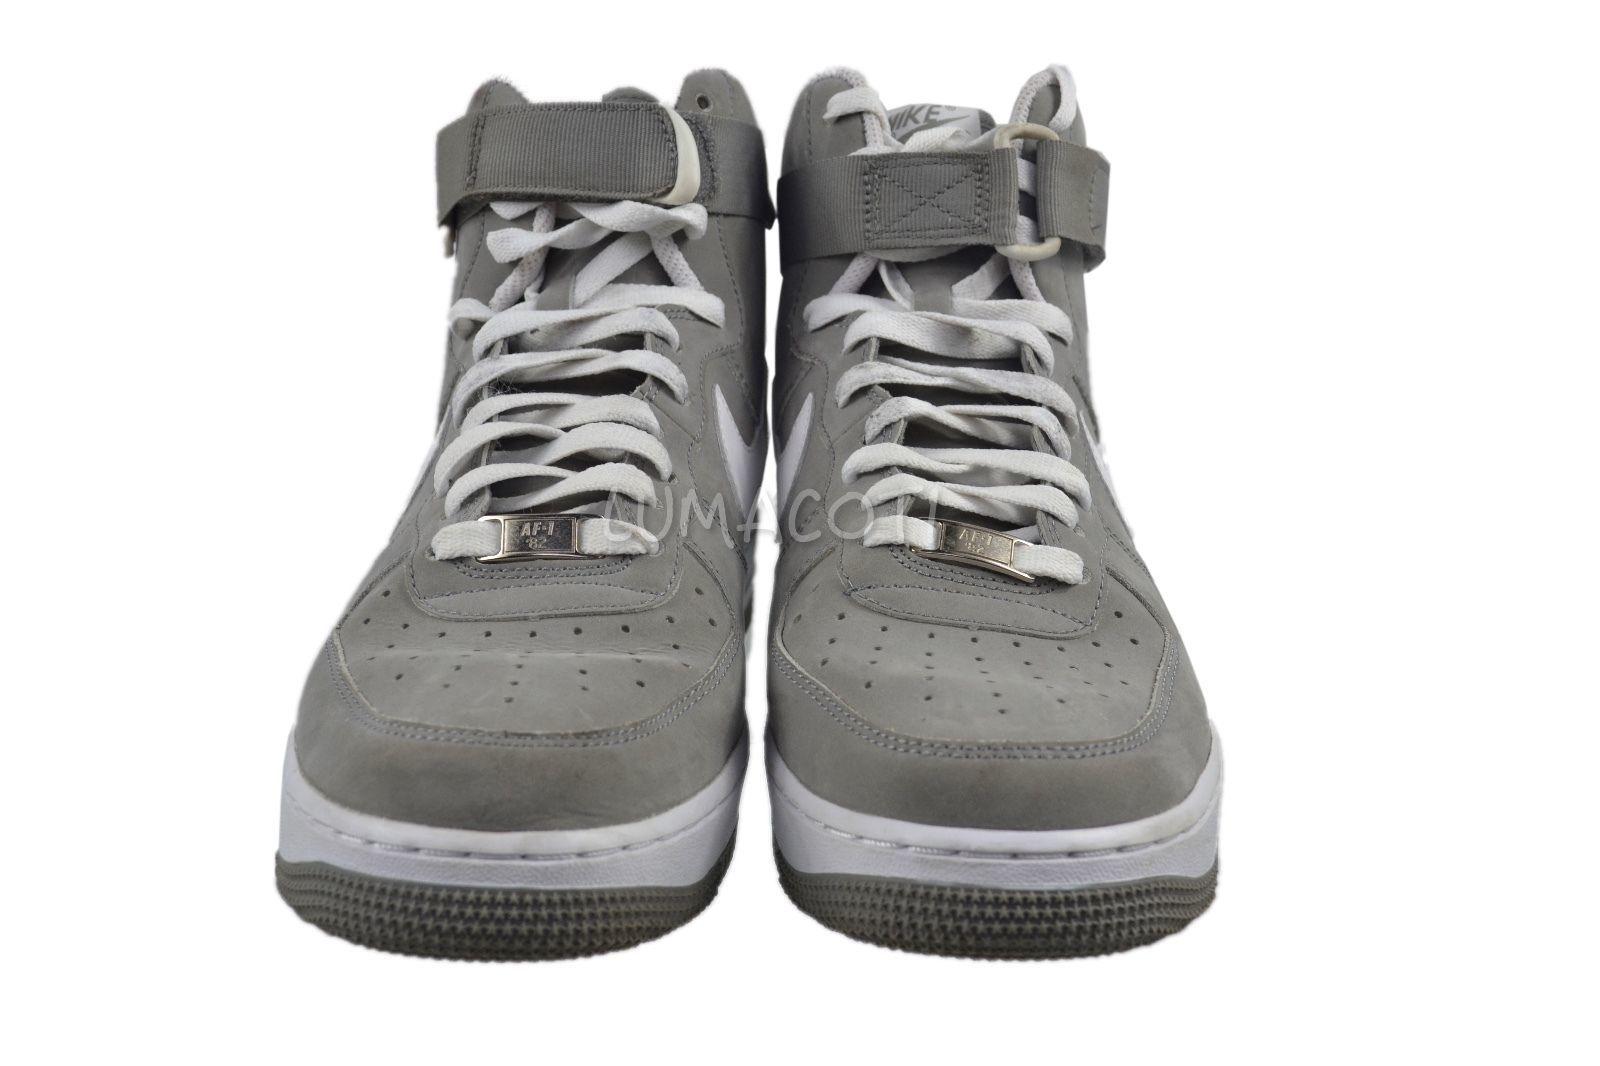 90f05e11a26 ... Nike Air Force 1 High  07 Charcoal White Mens Size 8.5  315121 ...